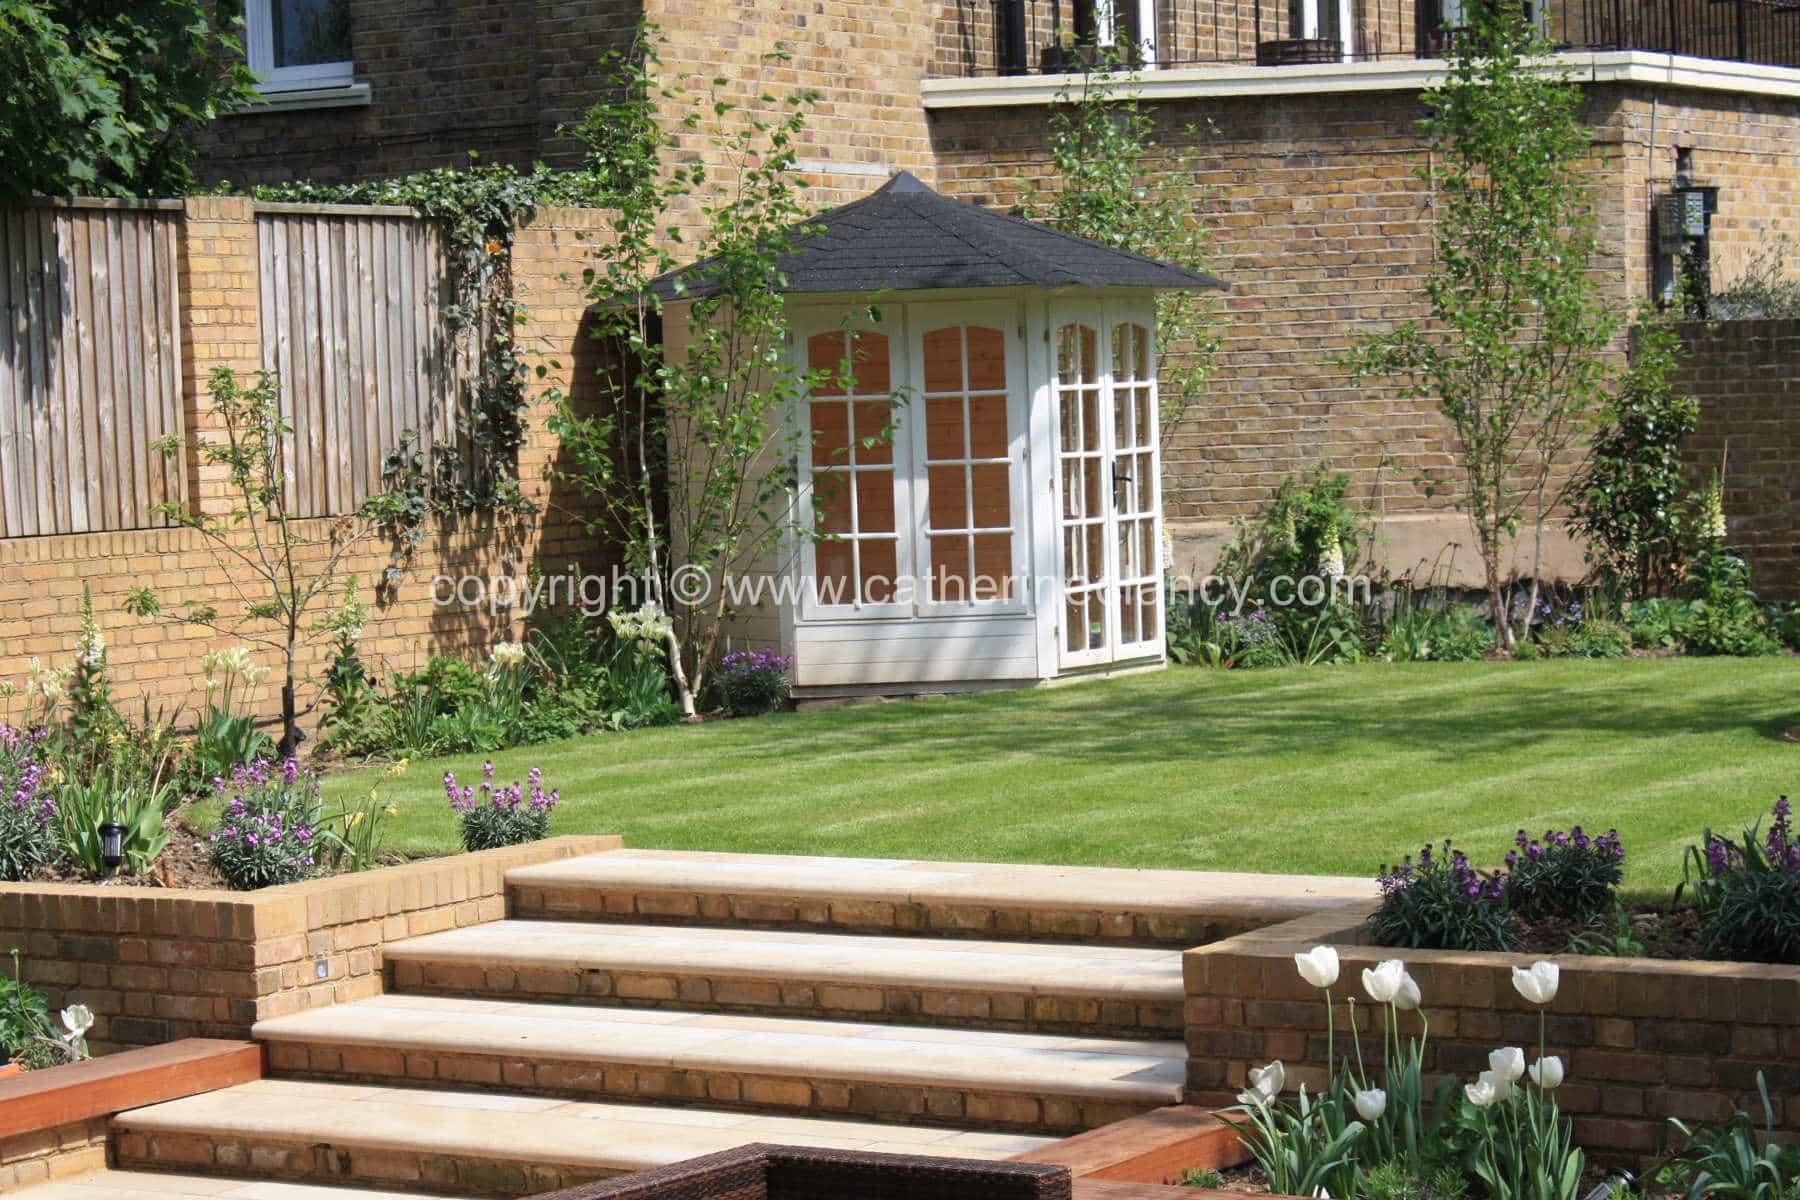 blackheath-family-garden-1